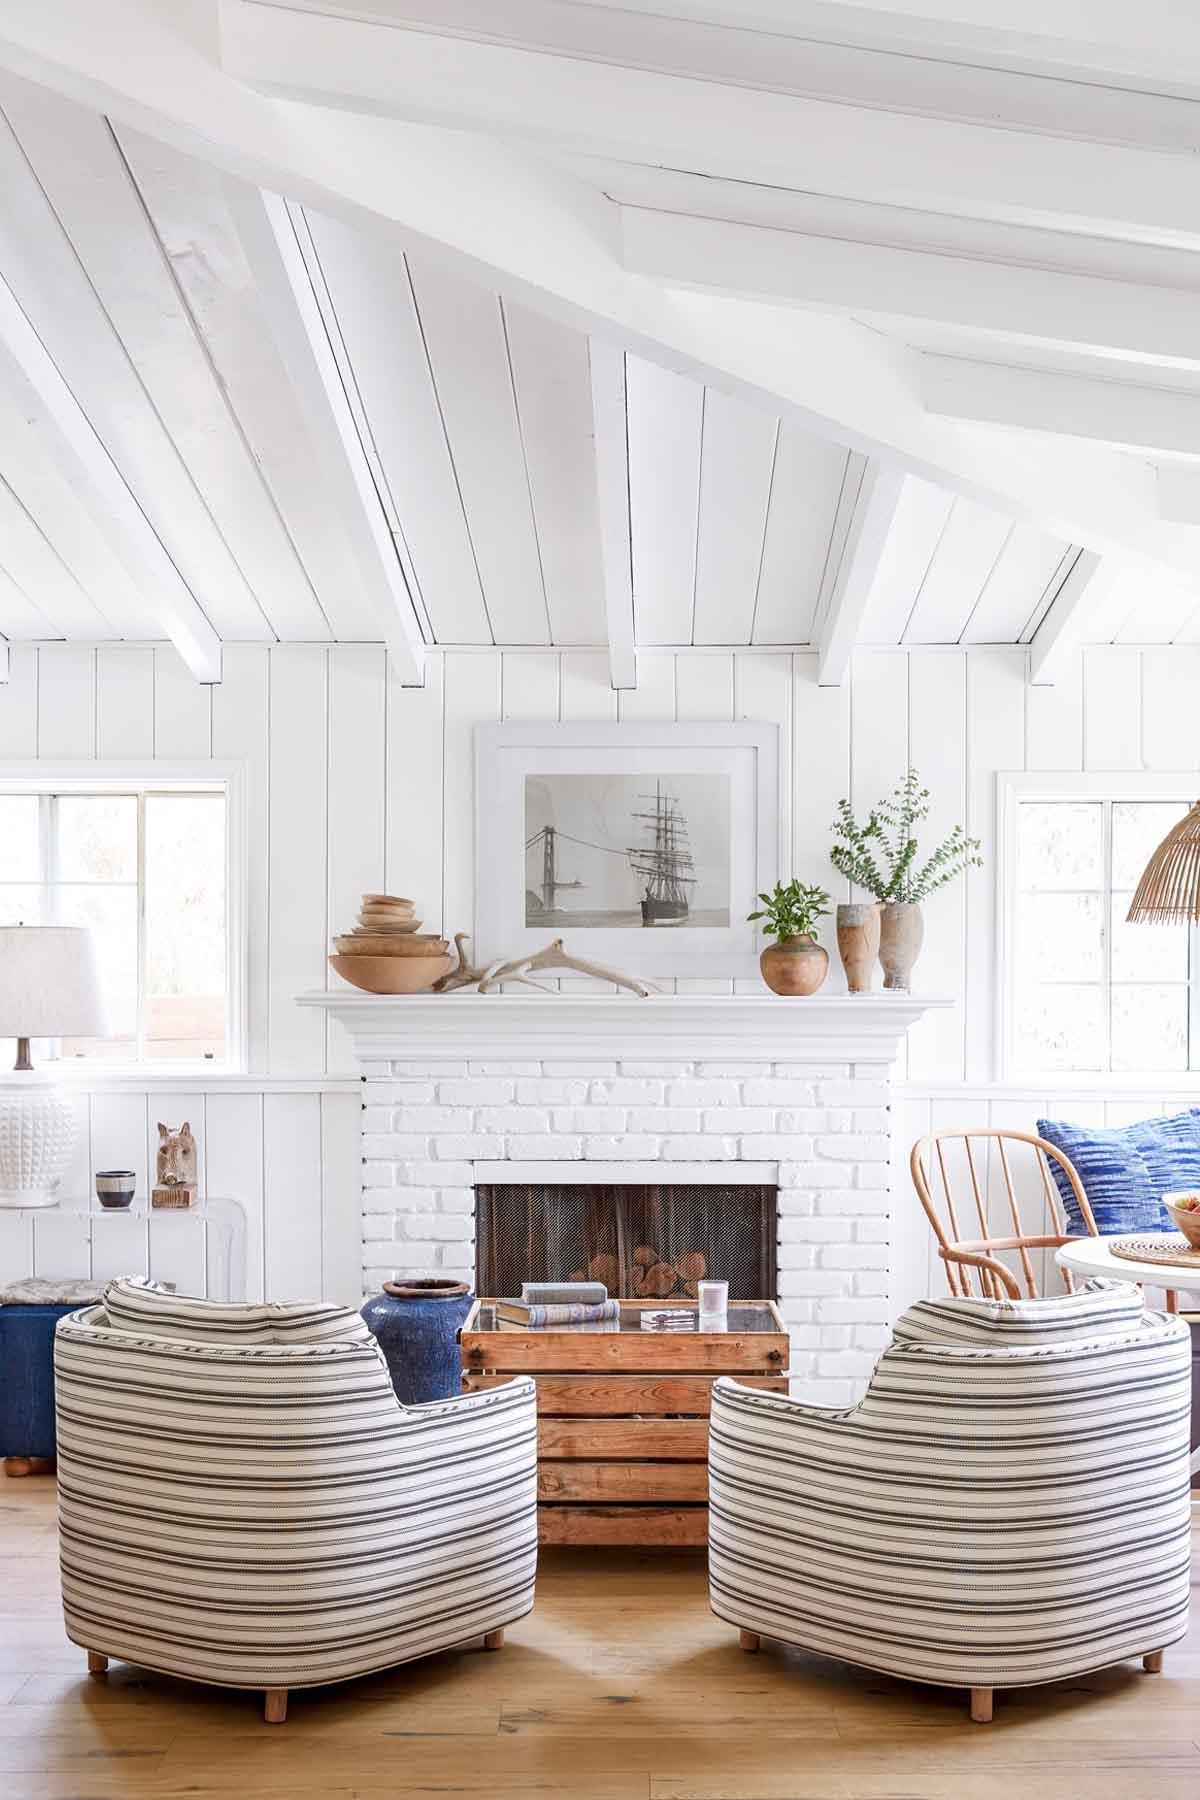 White Living Room Decor Ideas Awesome 25 White Living Room Decor Ideas for White Living Room